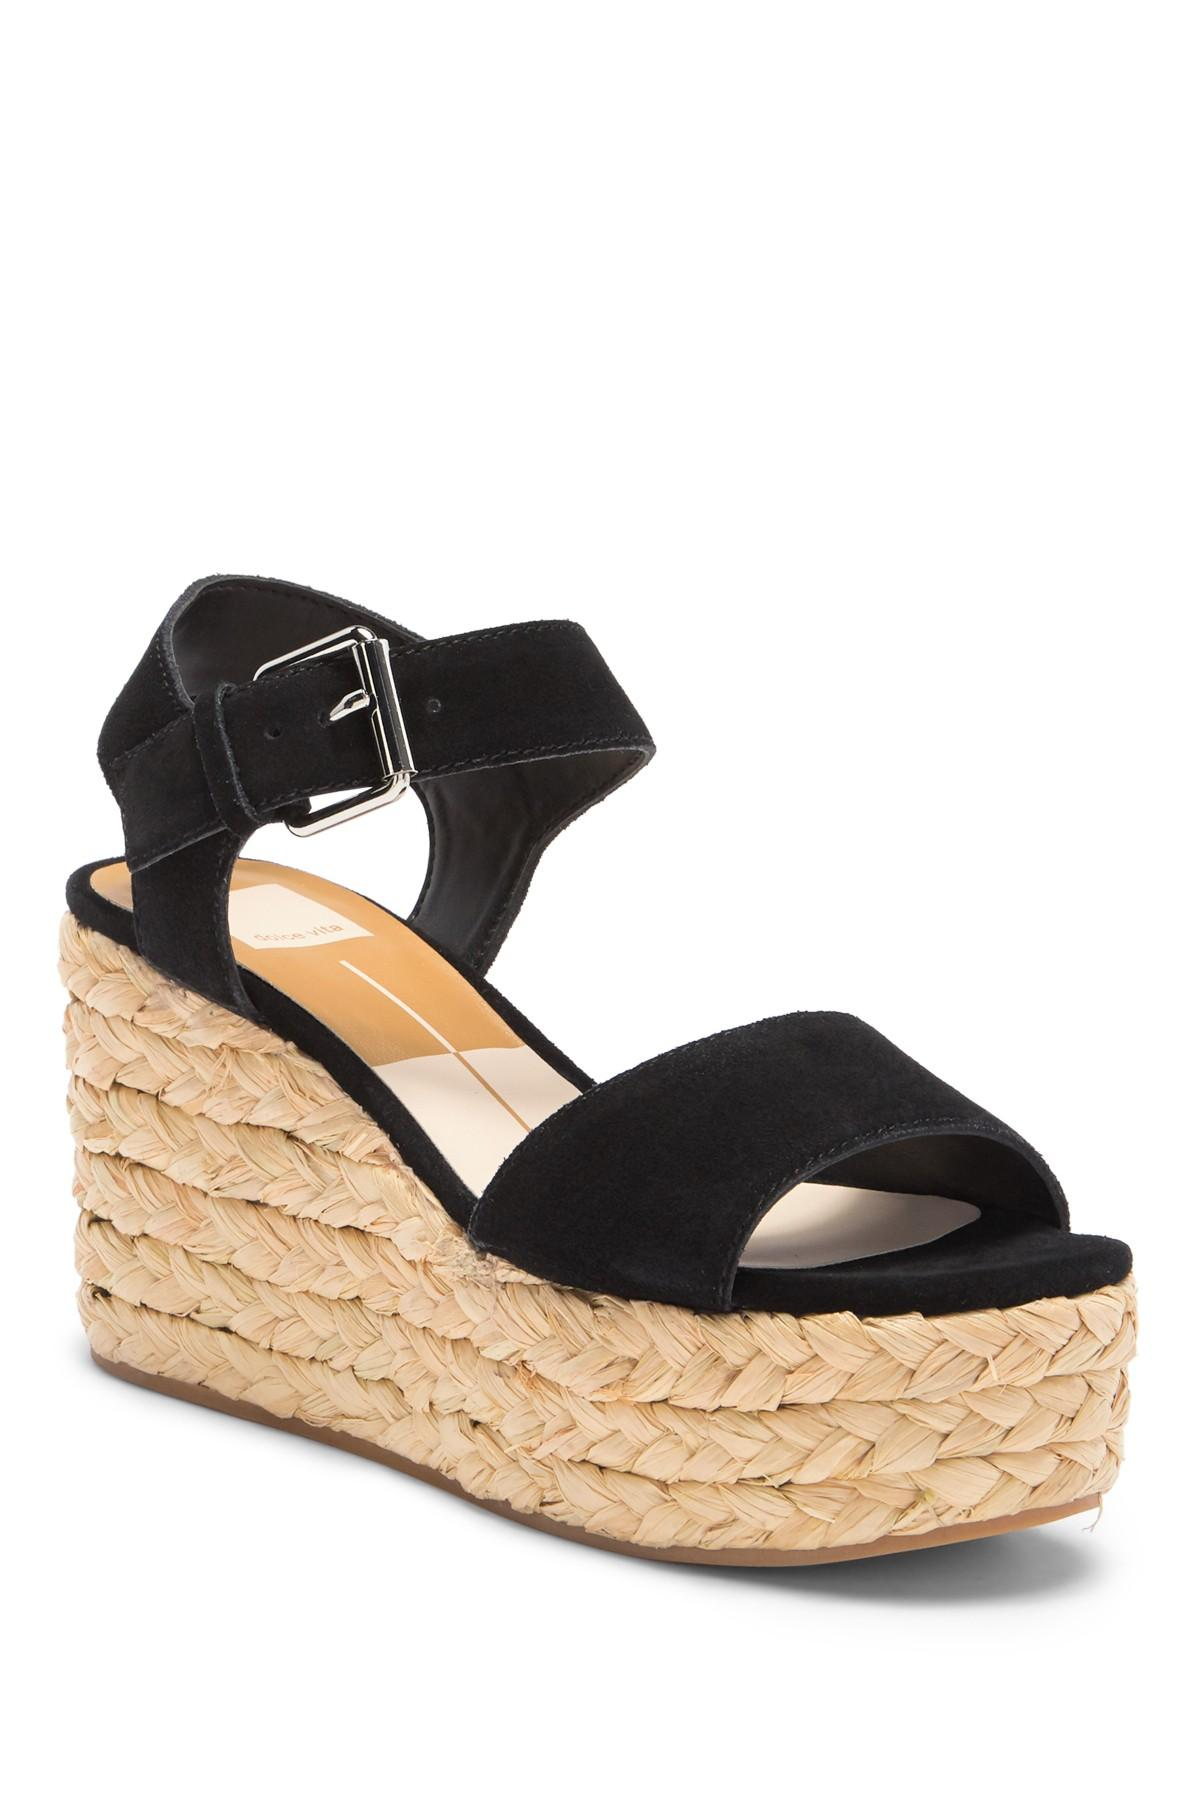 1e2967c3868 Dolce Vita Sacha Espadrille Platform Wedge Sandal in Black - Lyst